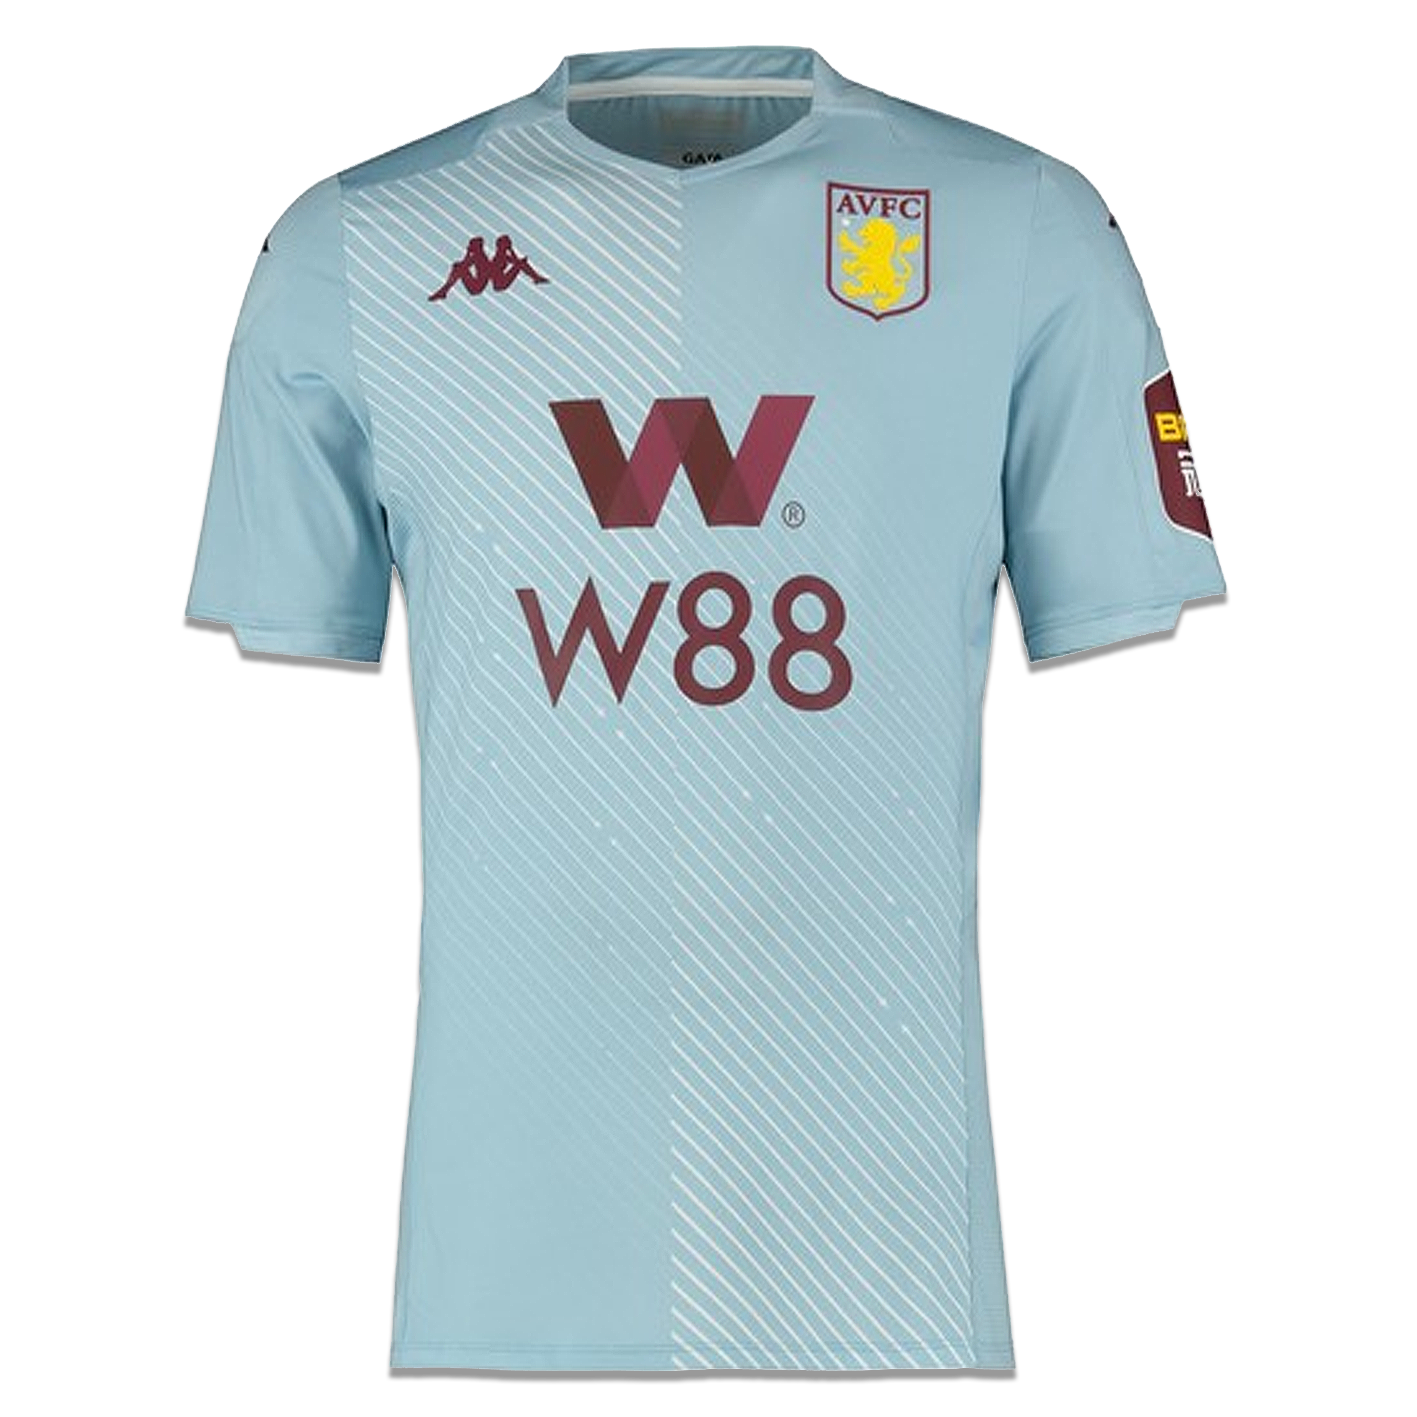 huge selection of 2914f 61fad Aston Villa 2019/20 Jersey Away Kappa   Football Kits ...